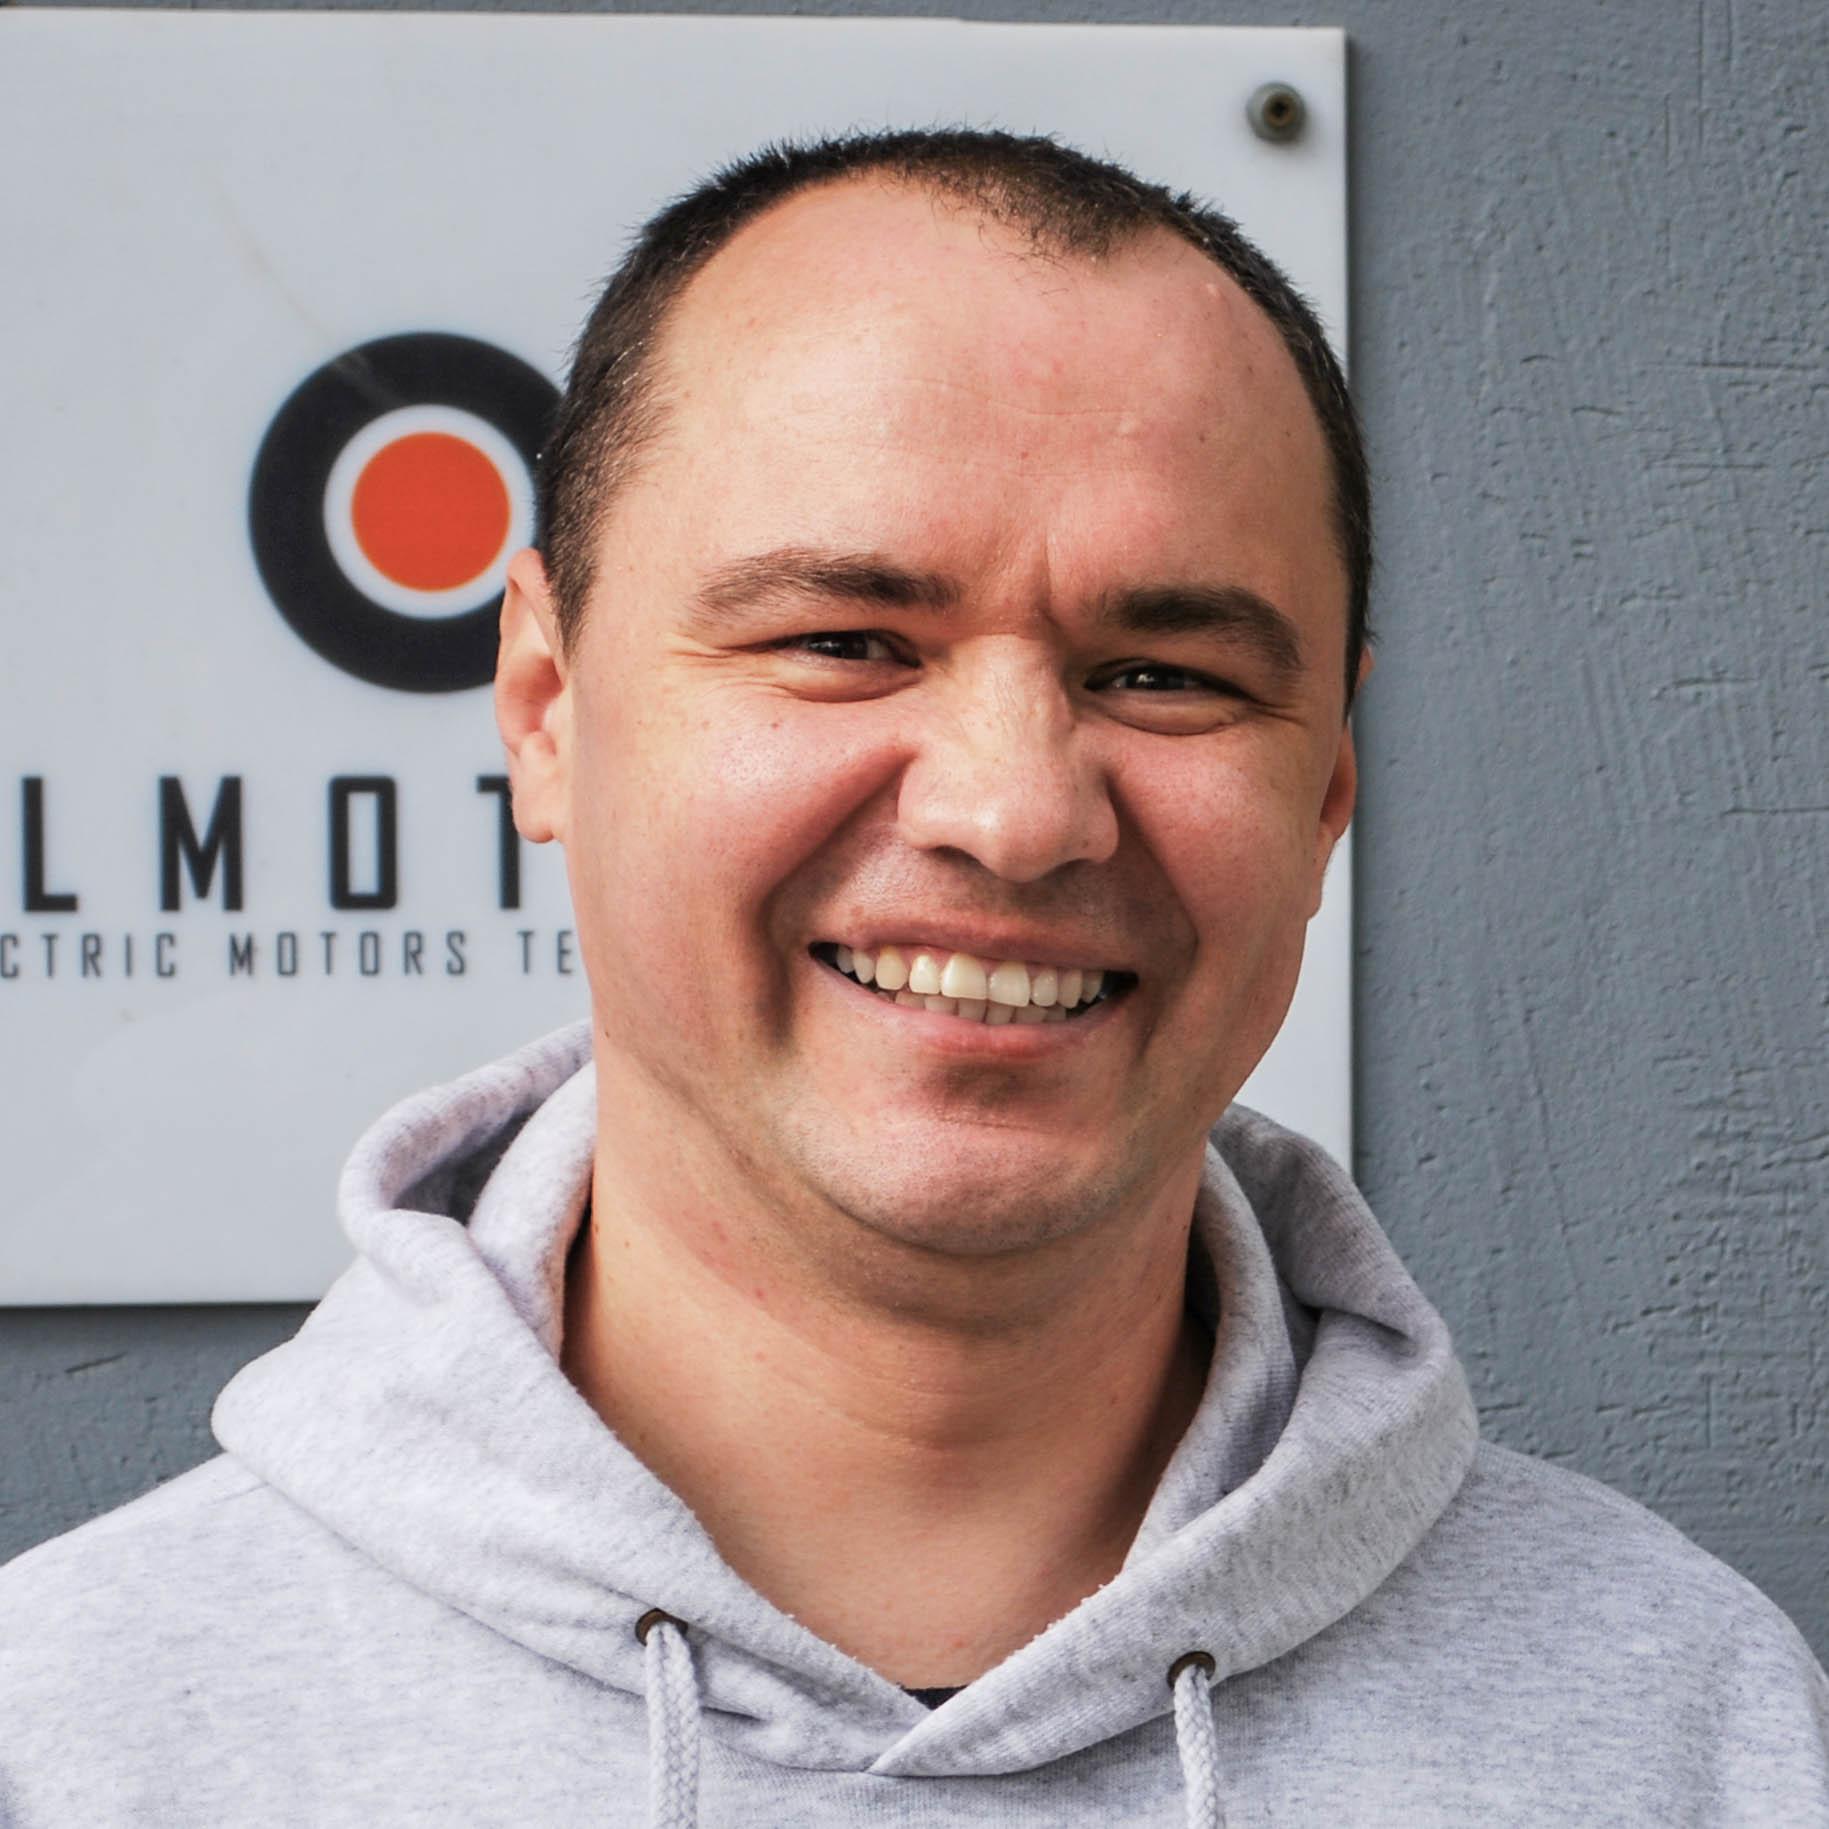 Denis Kolomoets